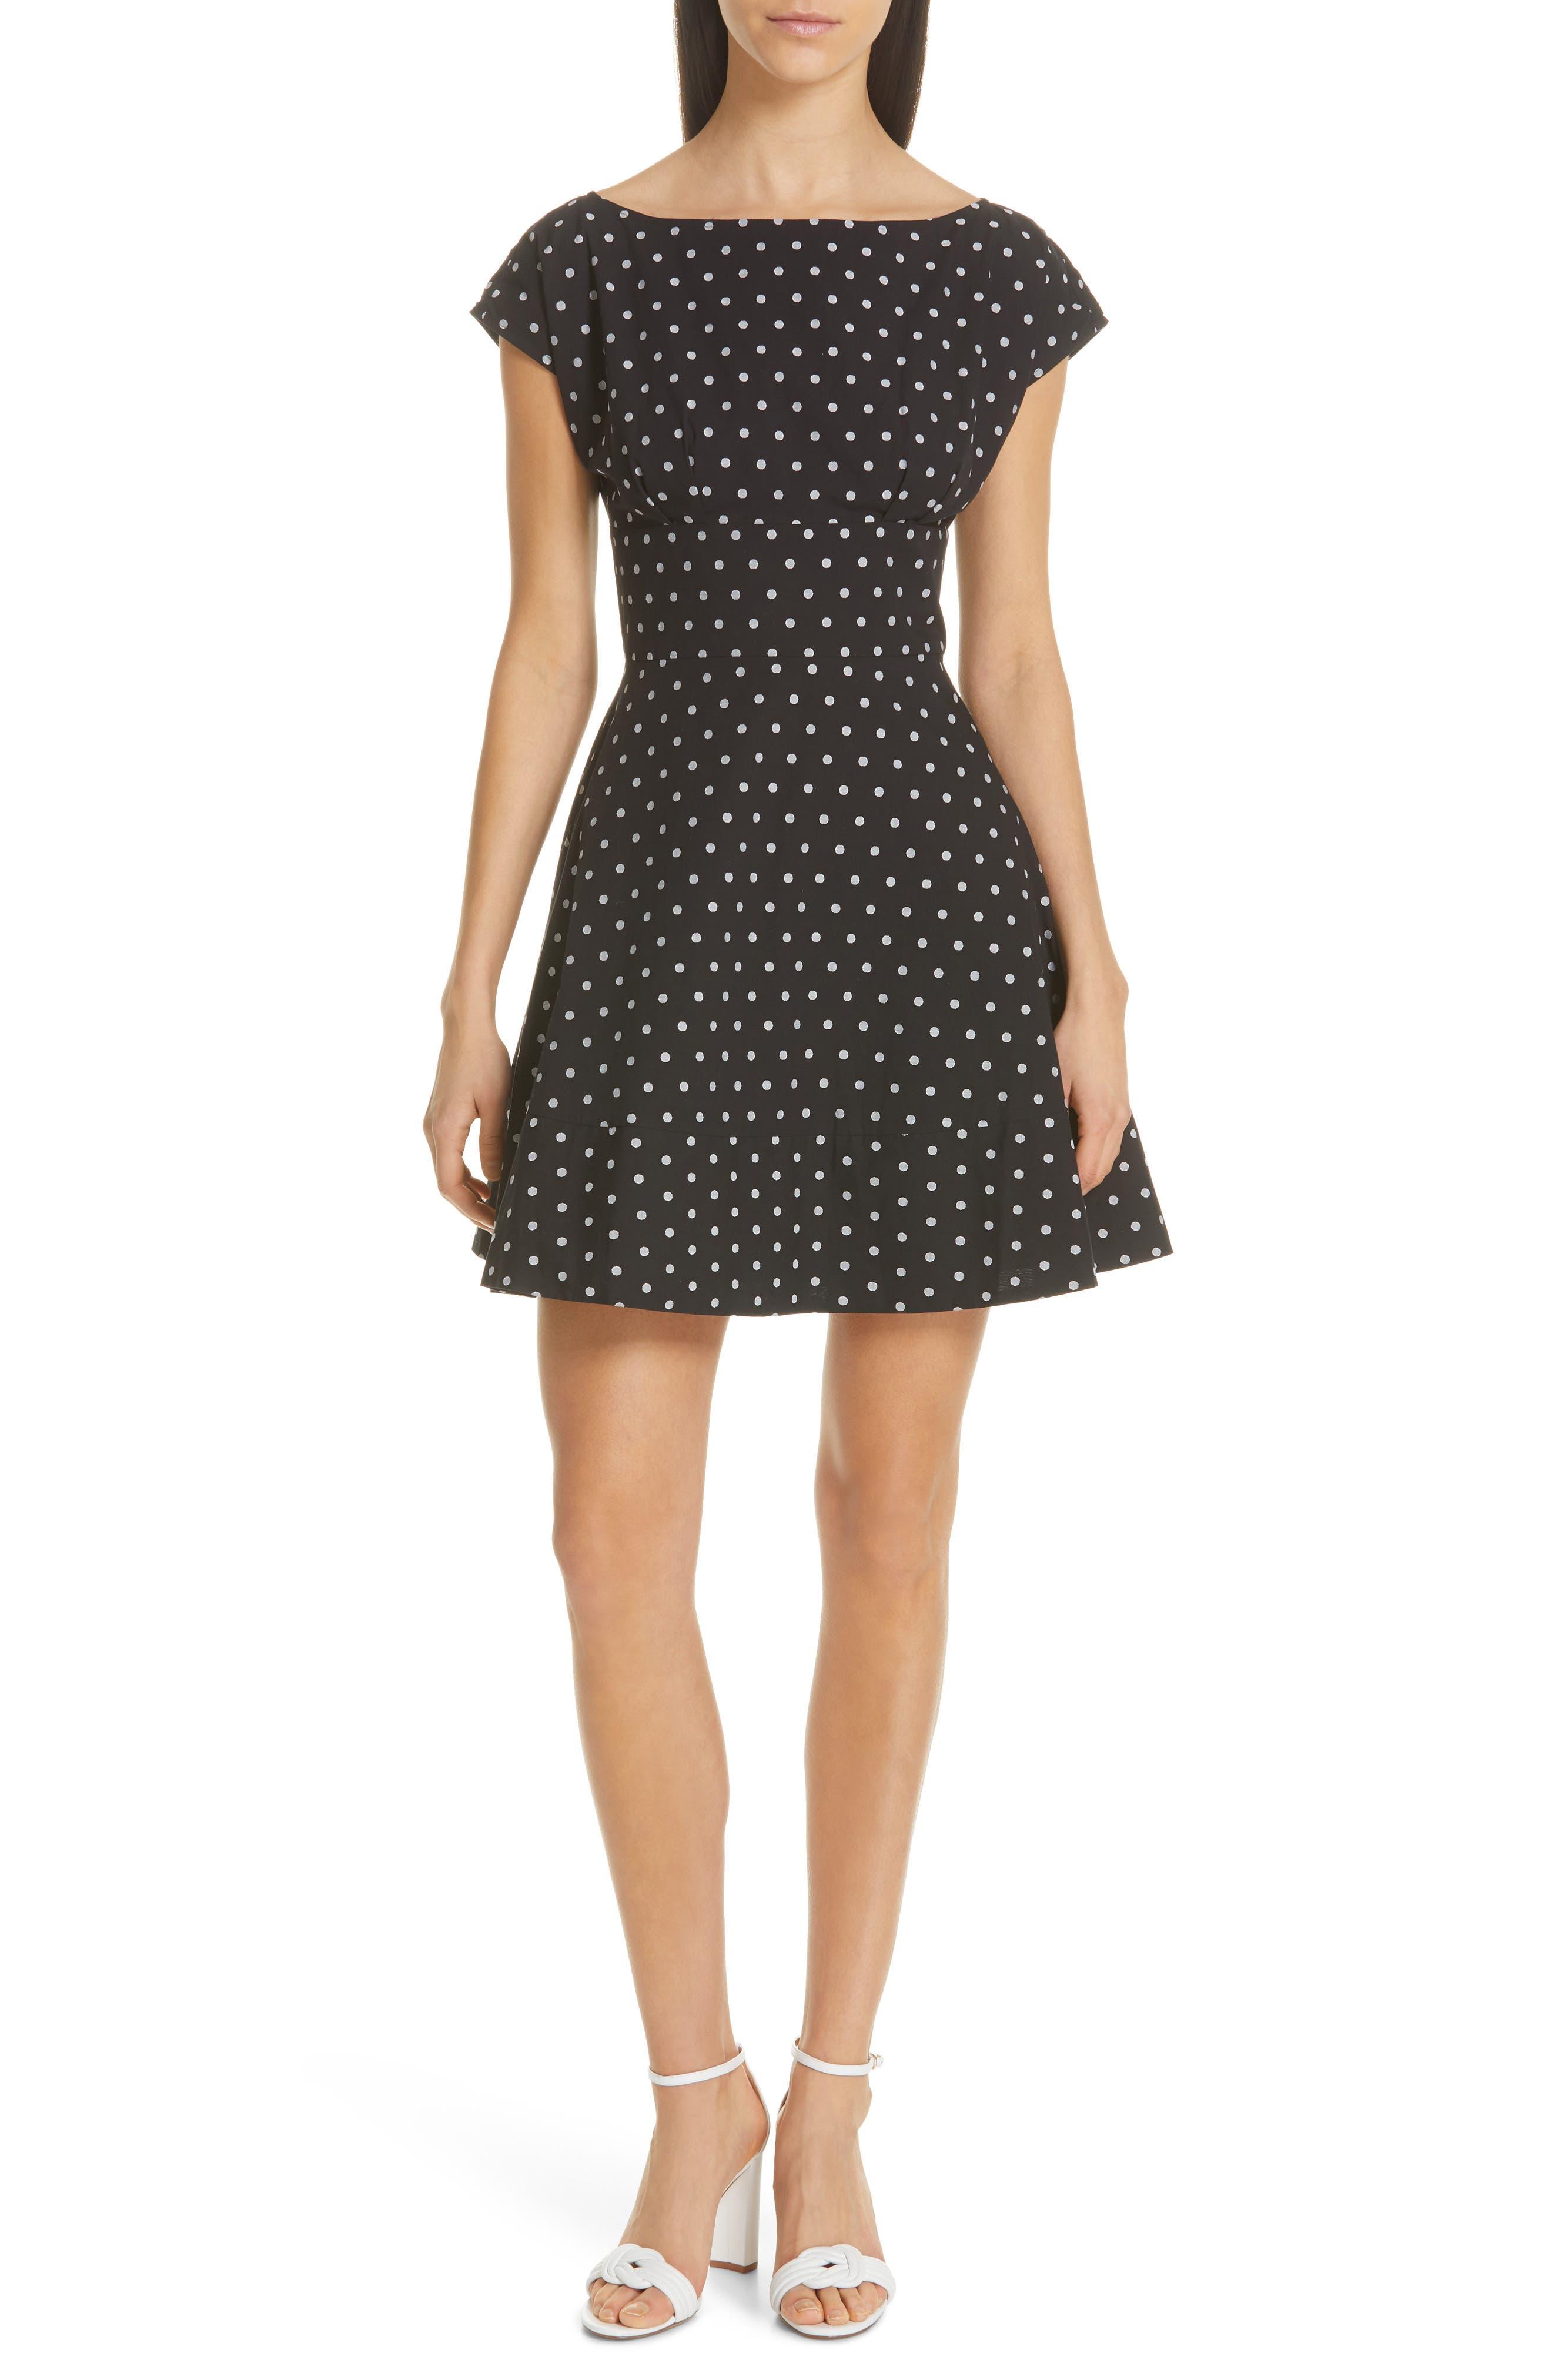 Kate Spade New York Fiorella Polka Dot Dress, Black